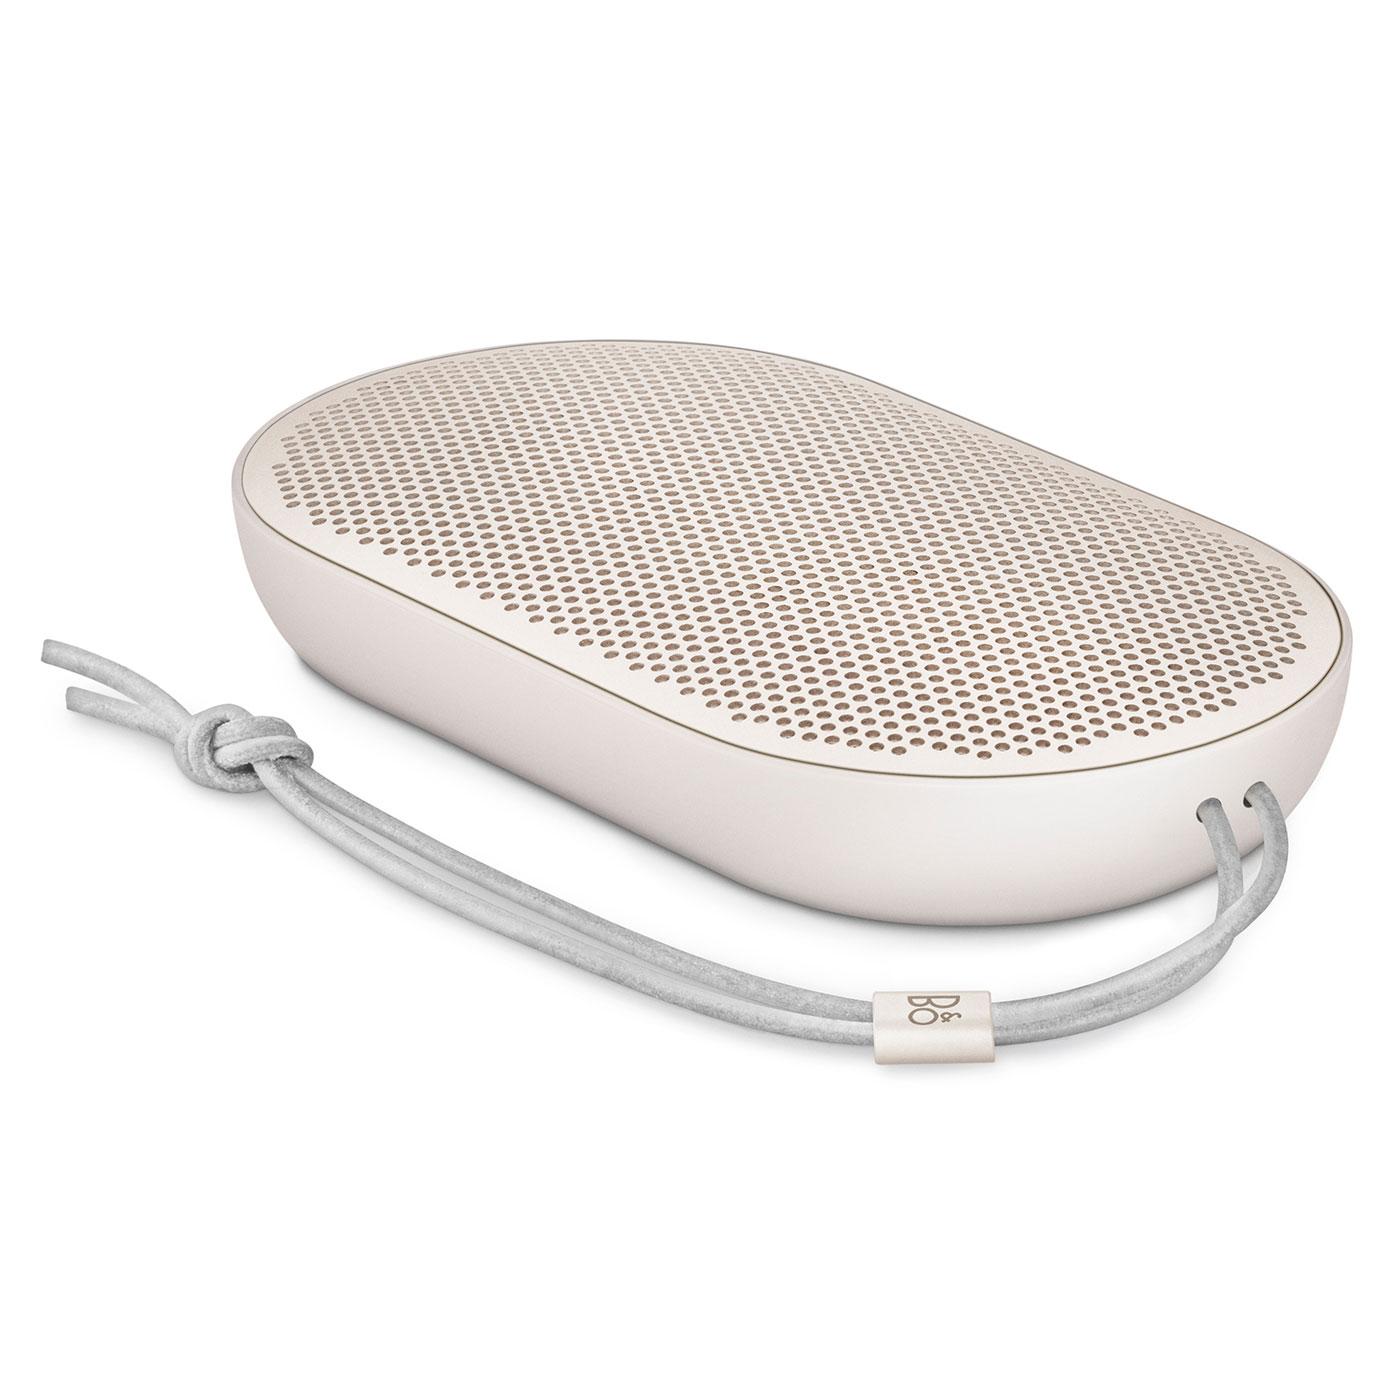 Dock & Enceinte Bluetooth Bang & Olufsen Beoplay P2 Sand Stone Enceinte portable Bluetooth 2 x 15W avec micro intégré